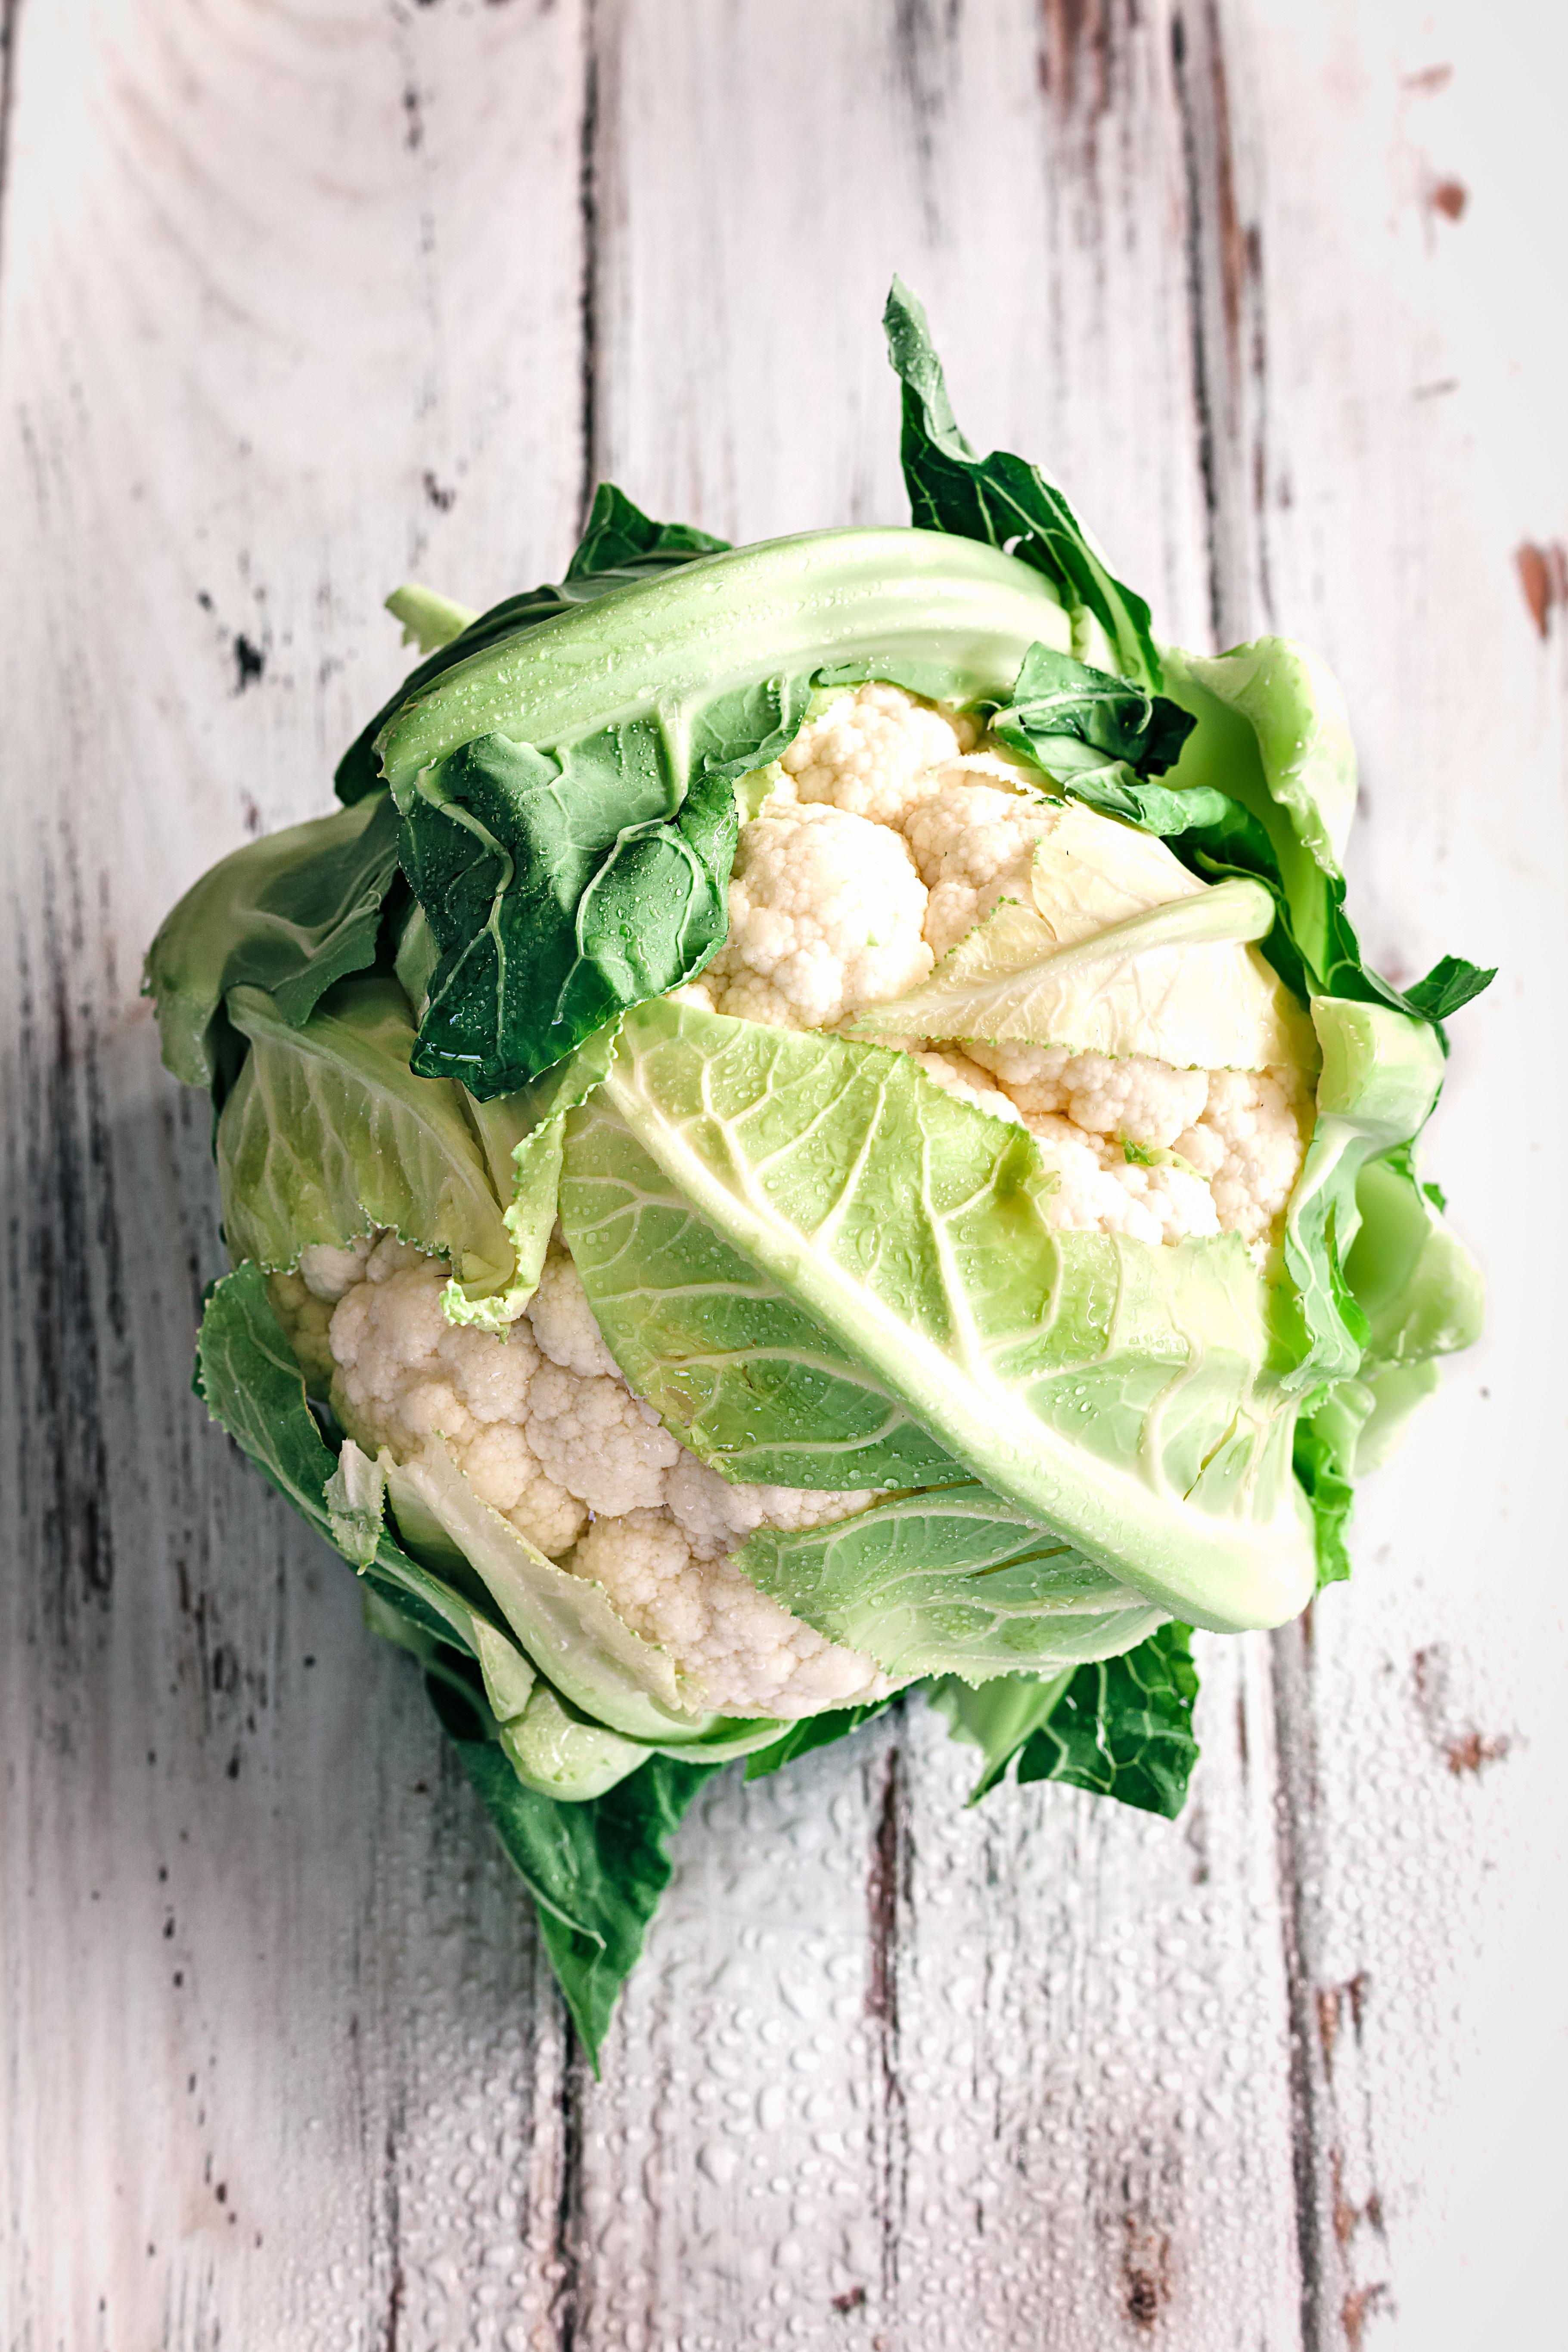 Cauliflower with Cumin Seed